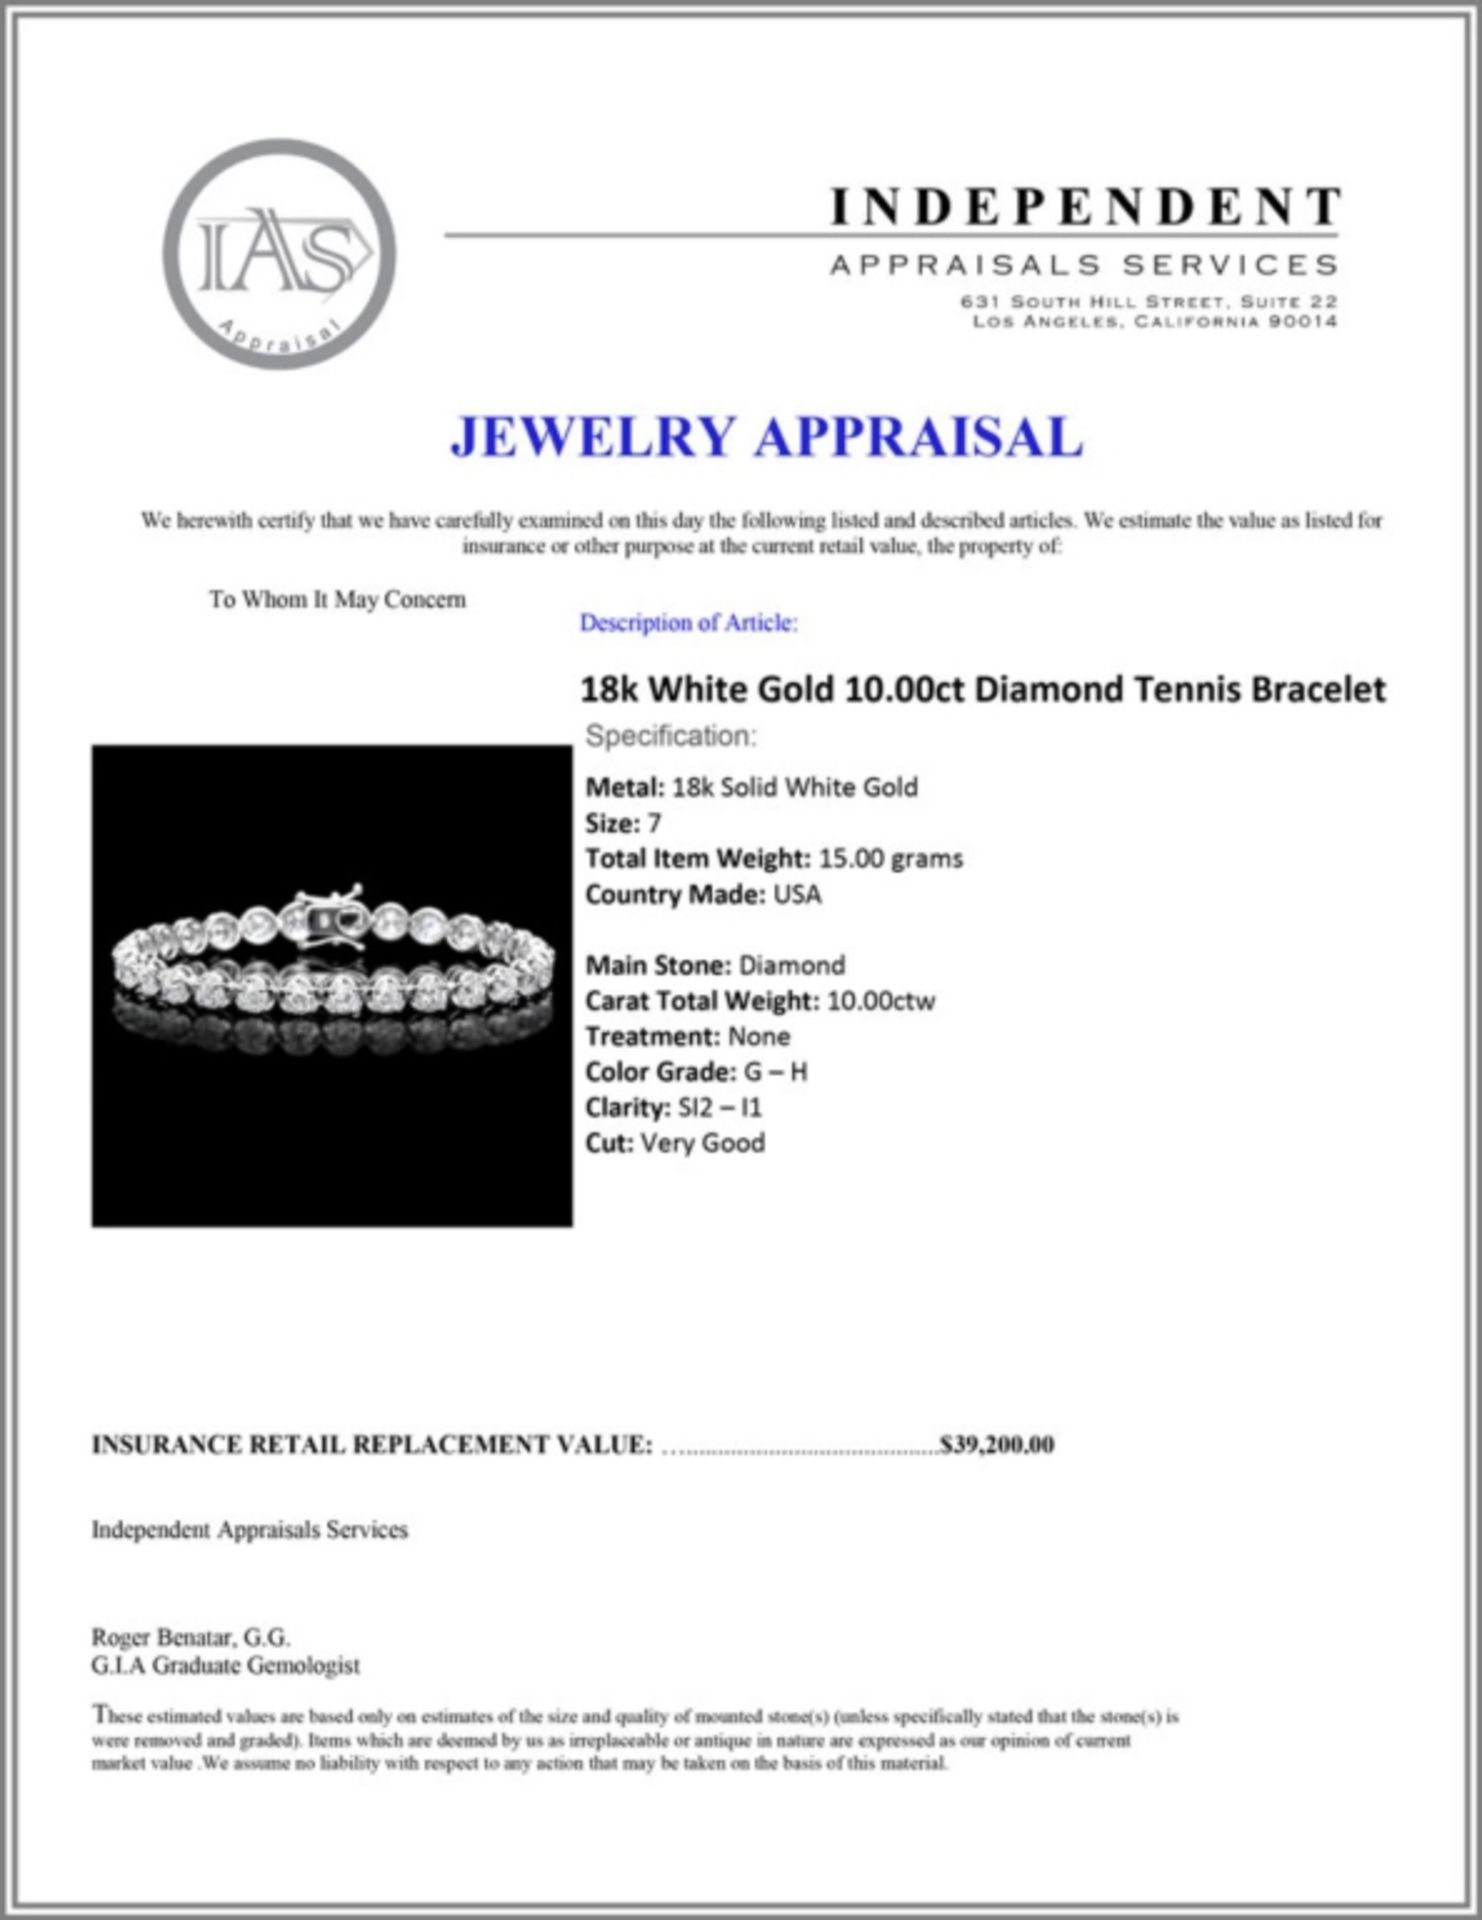 18k White Gold 10.00ct Diamond Tennis Bracelet - Image 3 of 3